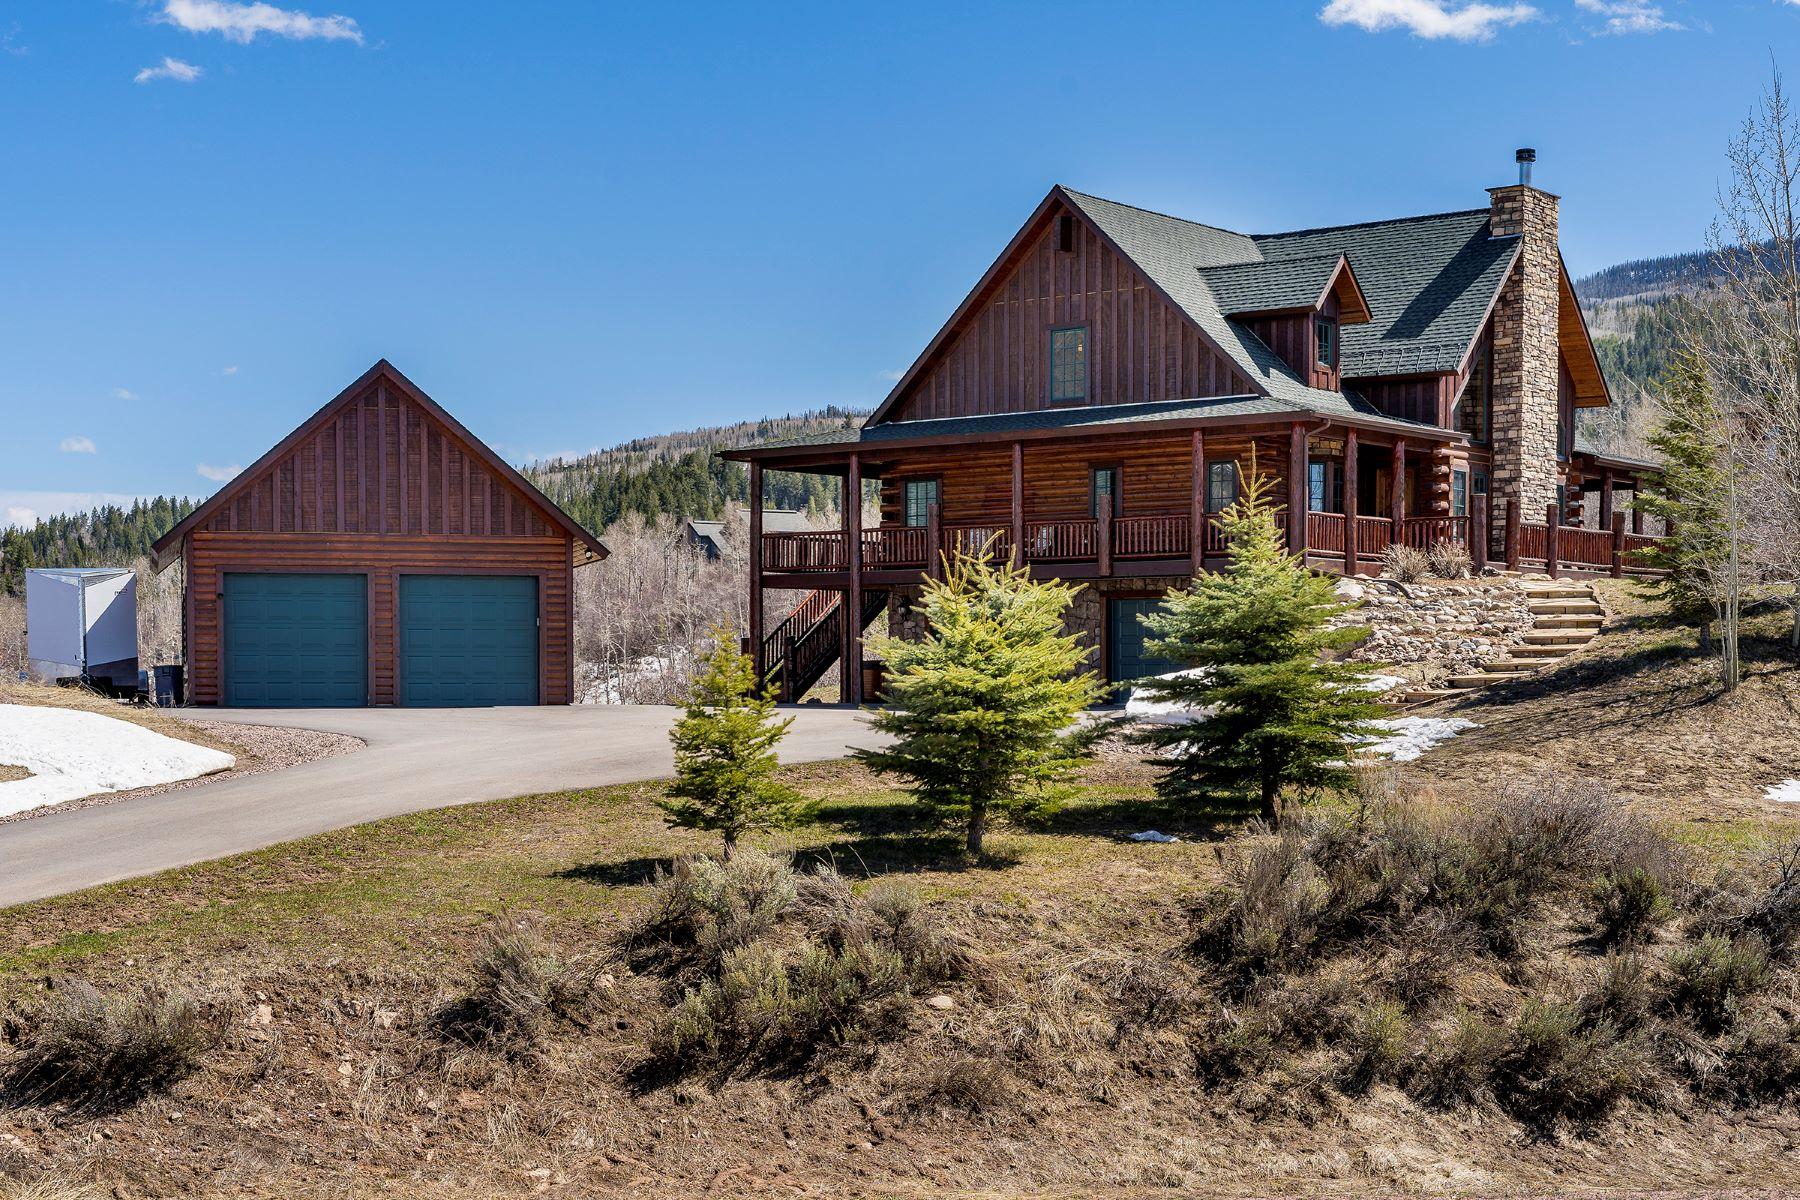 Single Family Homes for Active at Lovely Lynx Basin Home 23095 Lynx Basin Lane Oak Creek, Colorado 80467 United States